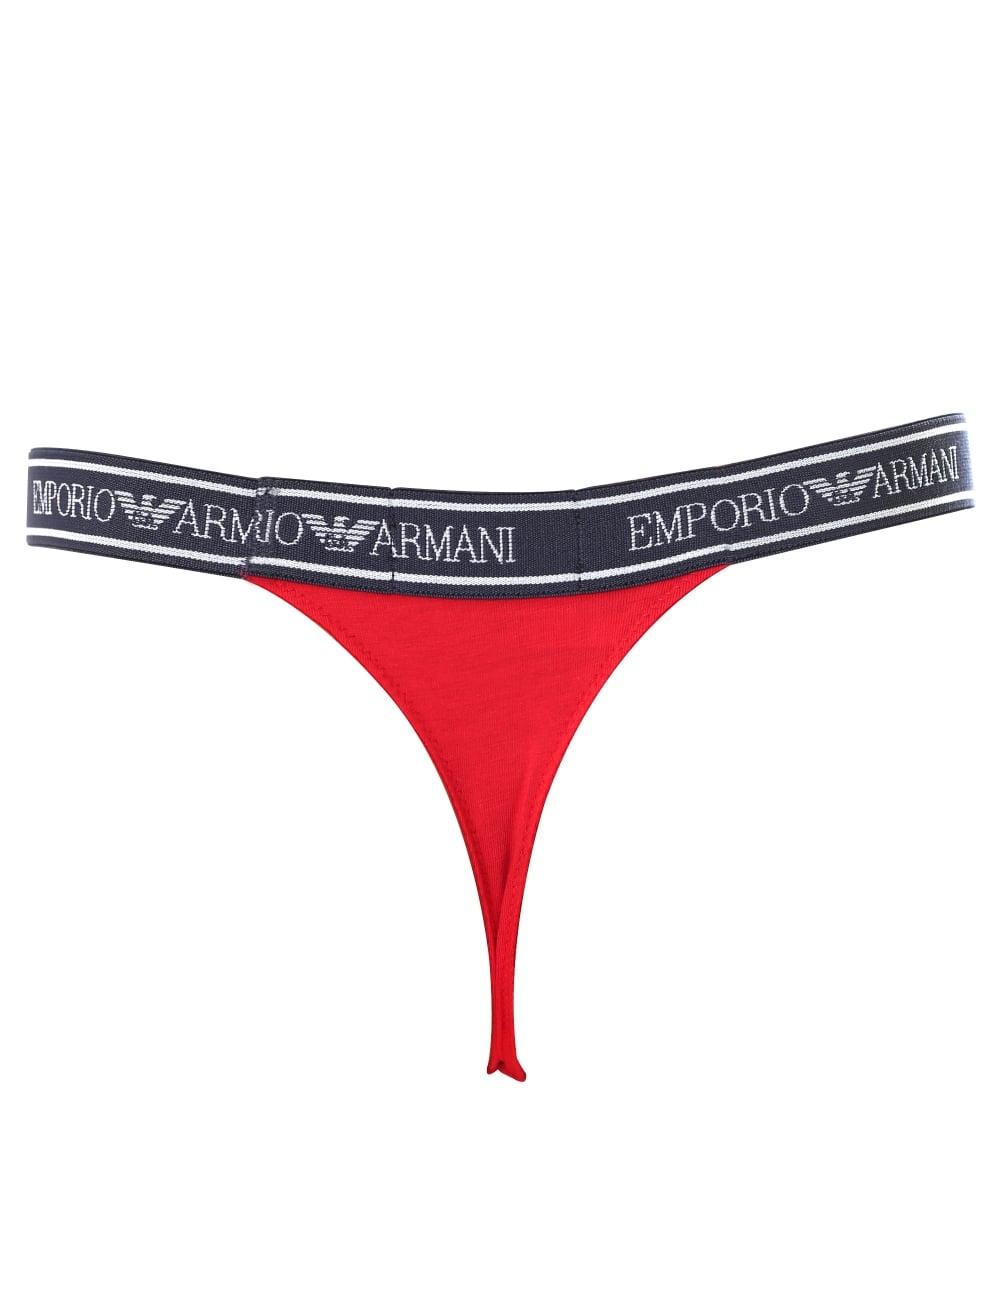 ab18416cb ... Emporio Armani Women s Logo Waistband Thong. Tap image to zoom.  Women  039 s Logo Waistband Thong